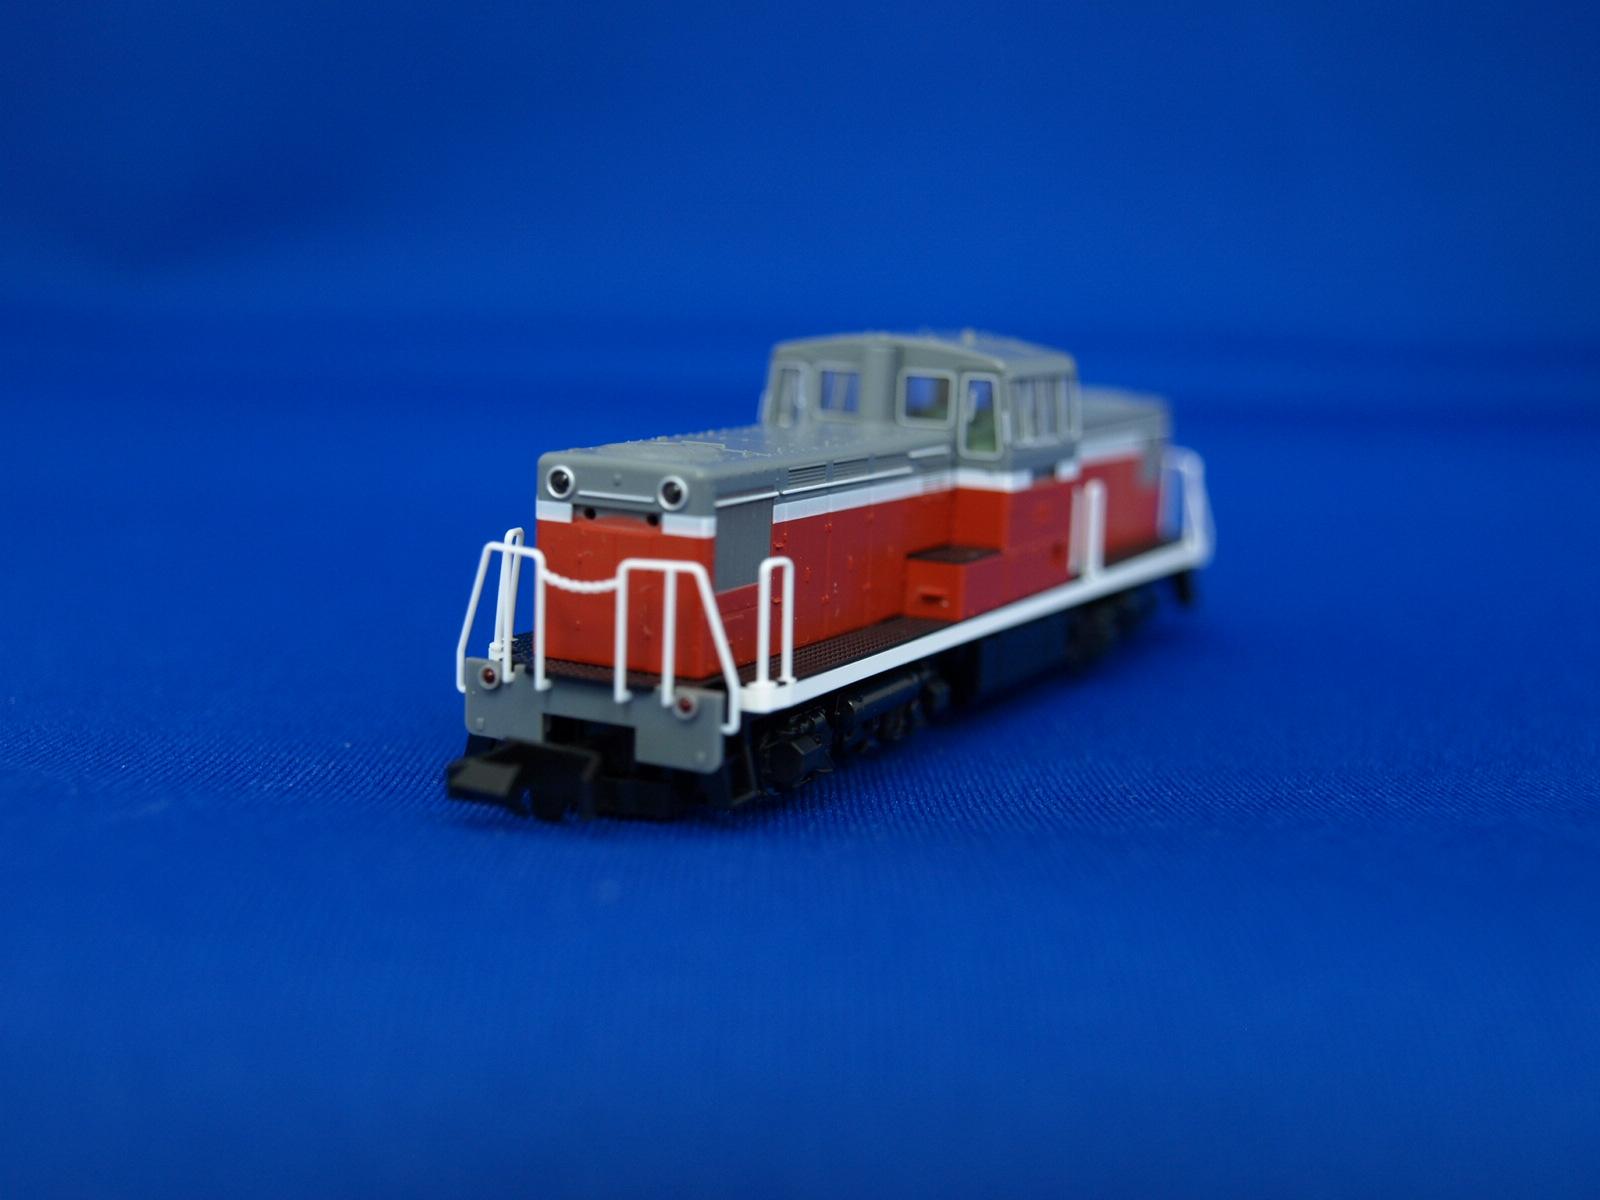 Nゲージ トミックス 2227  国鉄 DD13-300形ディーゼル機関車(一般型)